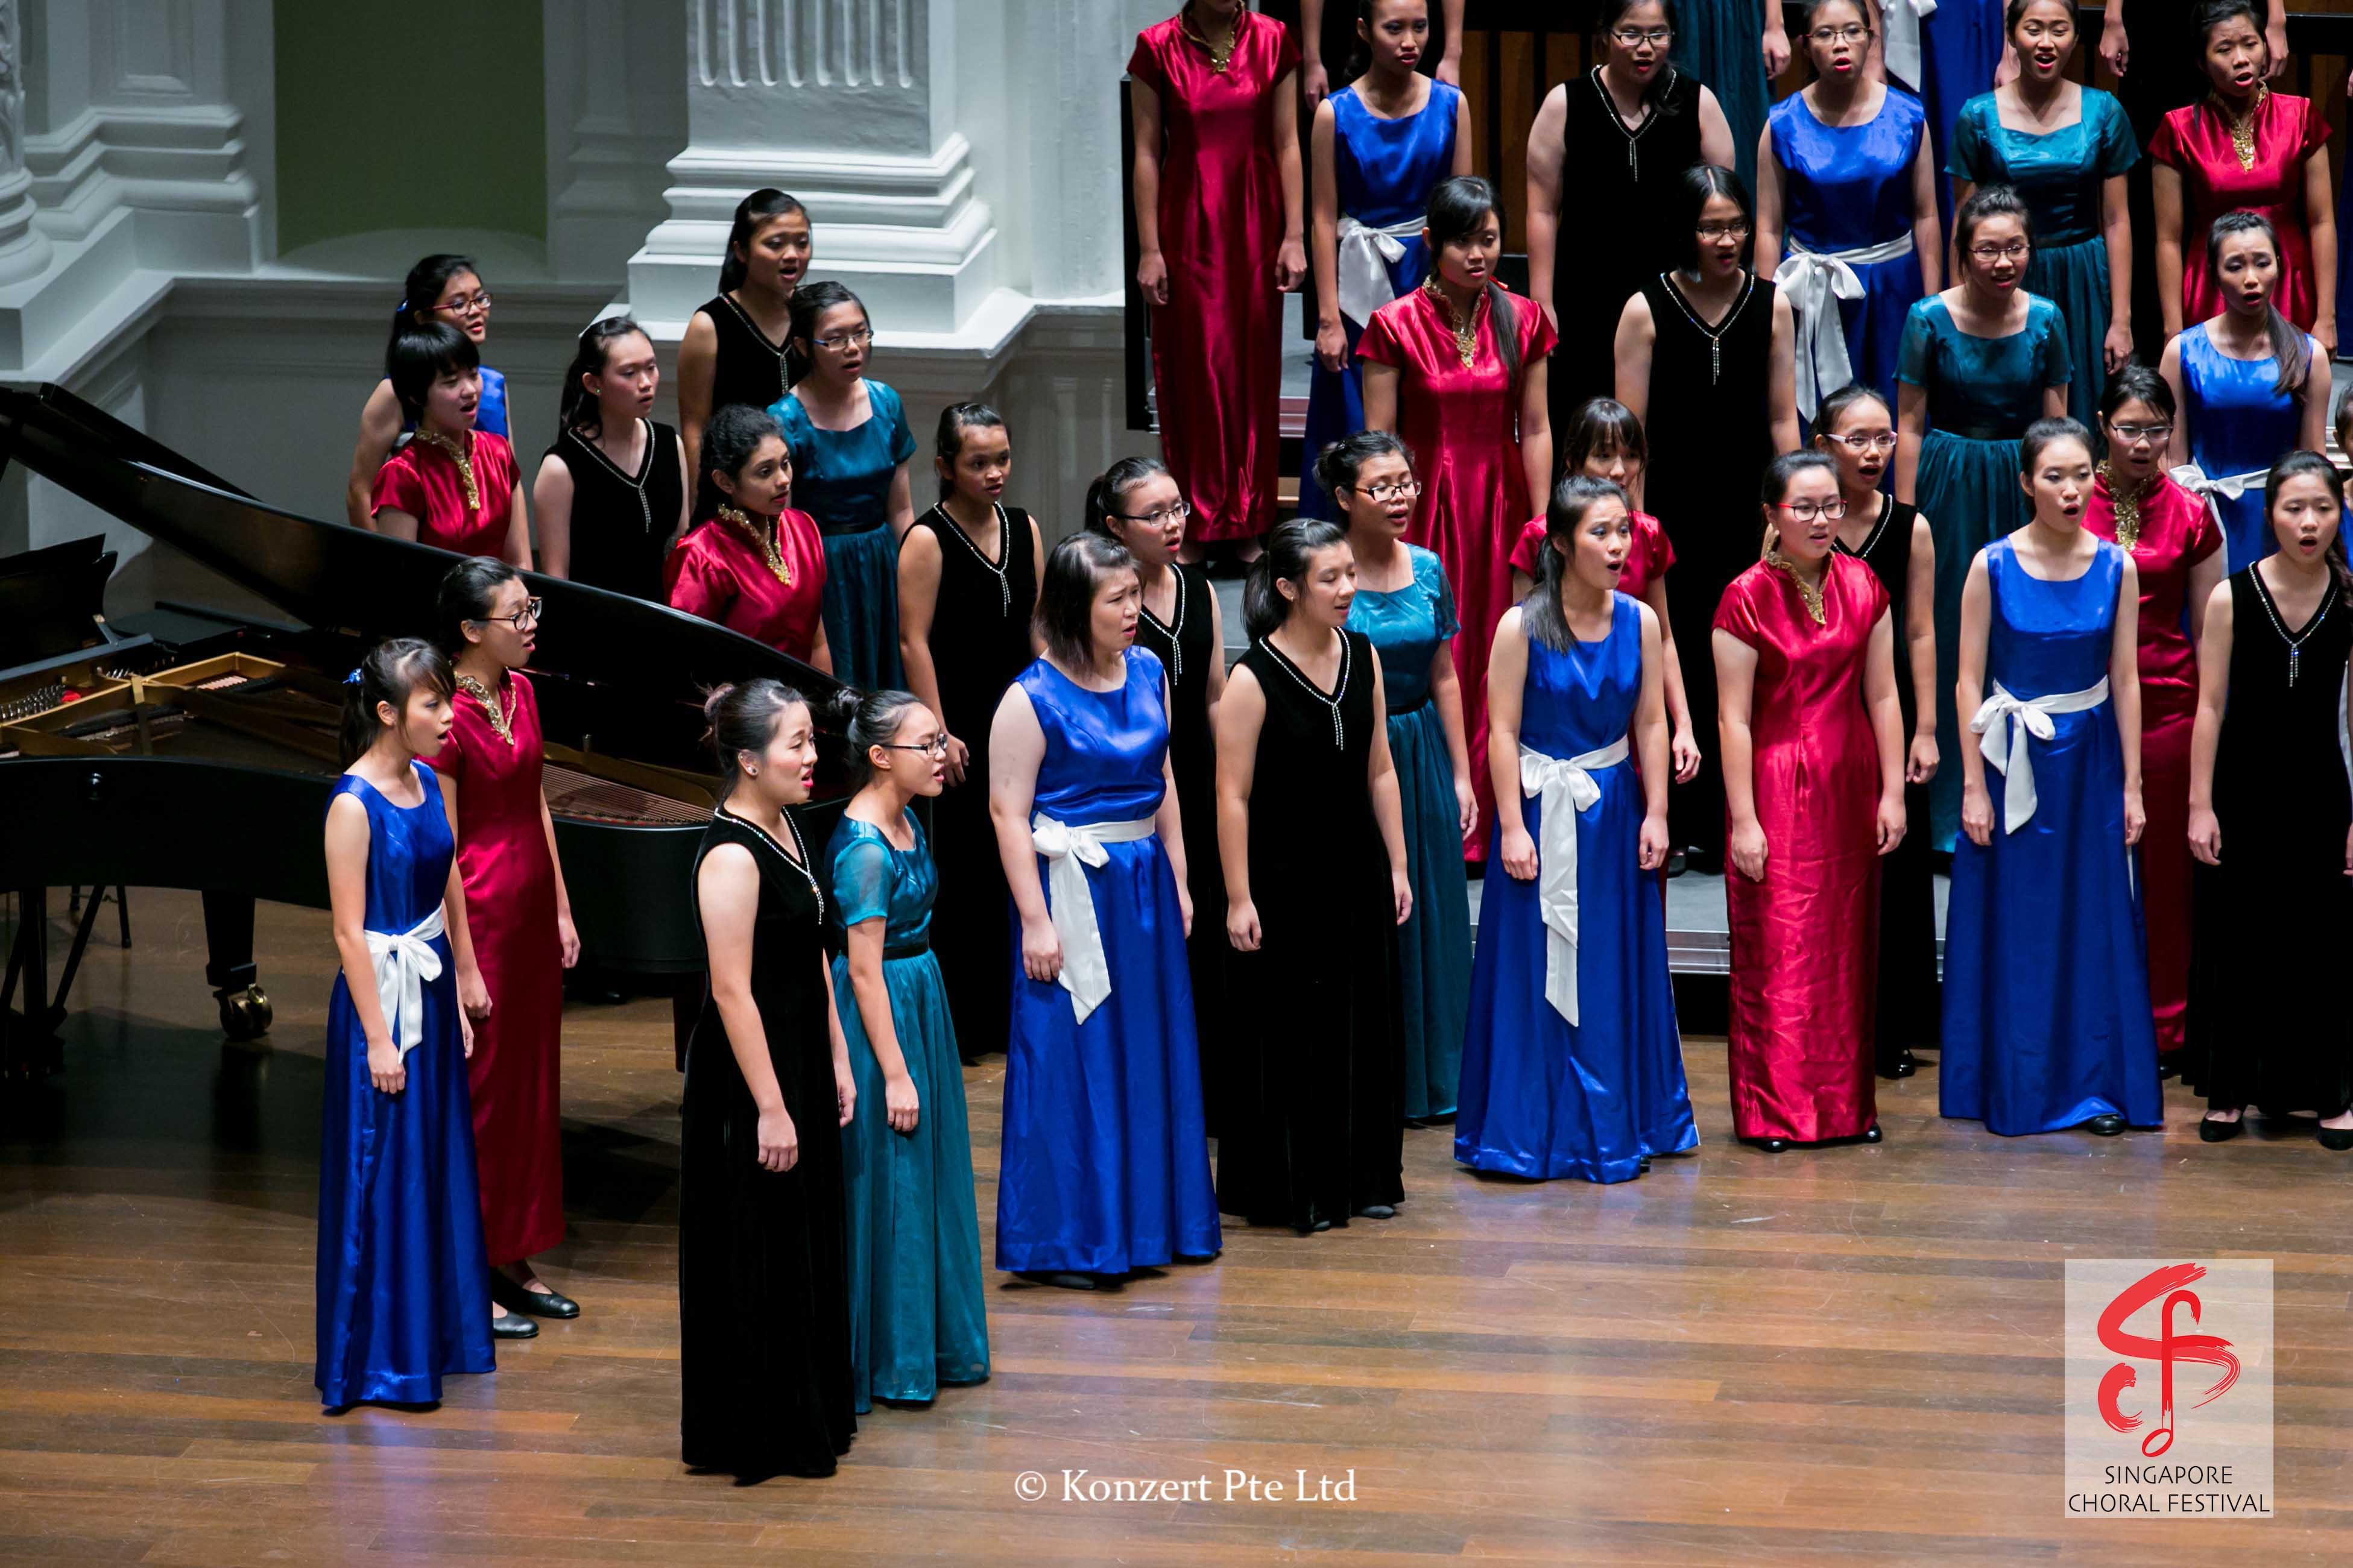 Singapore Choral Festival 7-8-15 (309).jpg